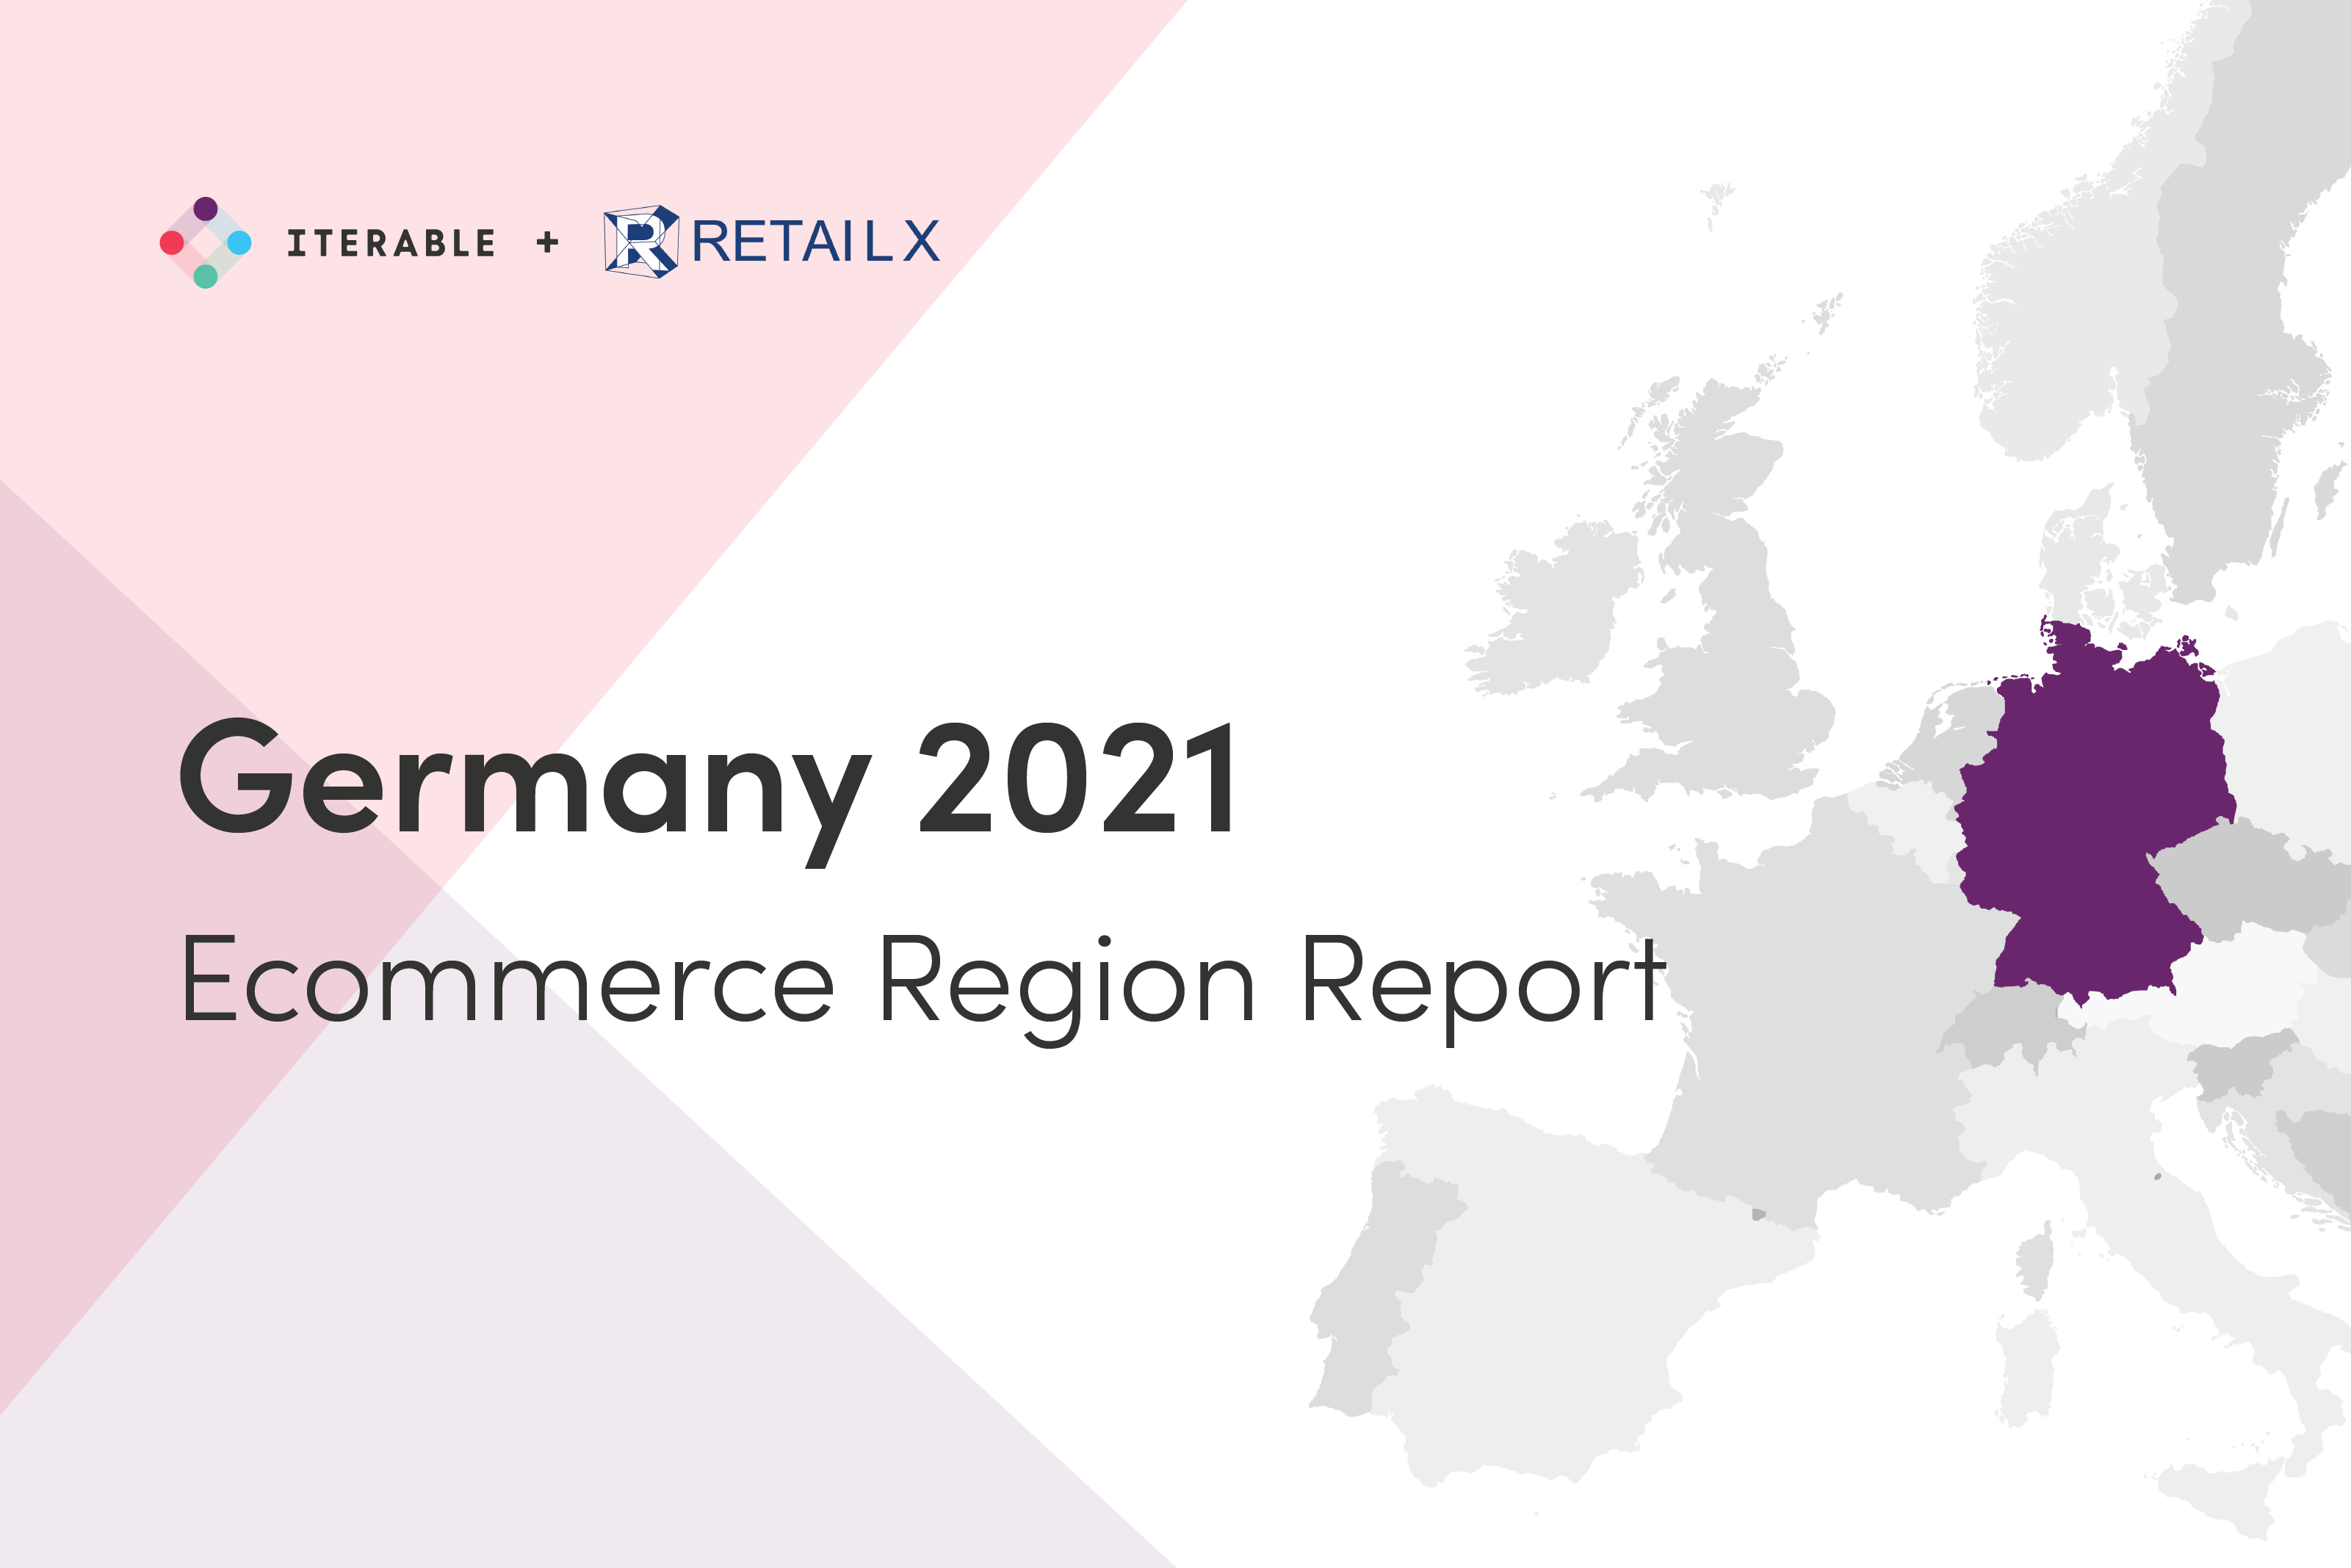 Germany Ecommerce Report